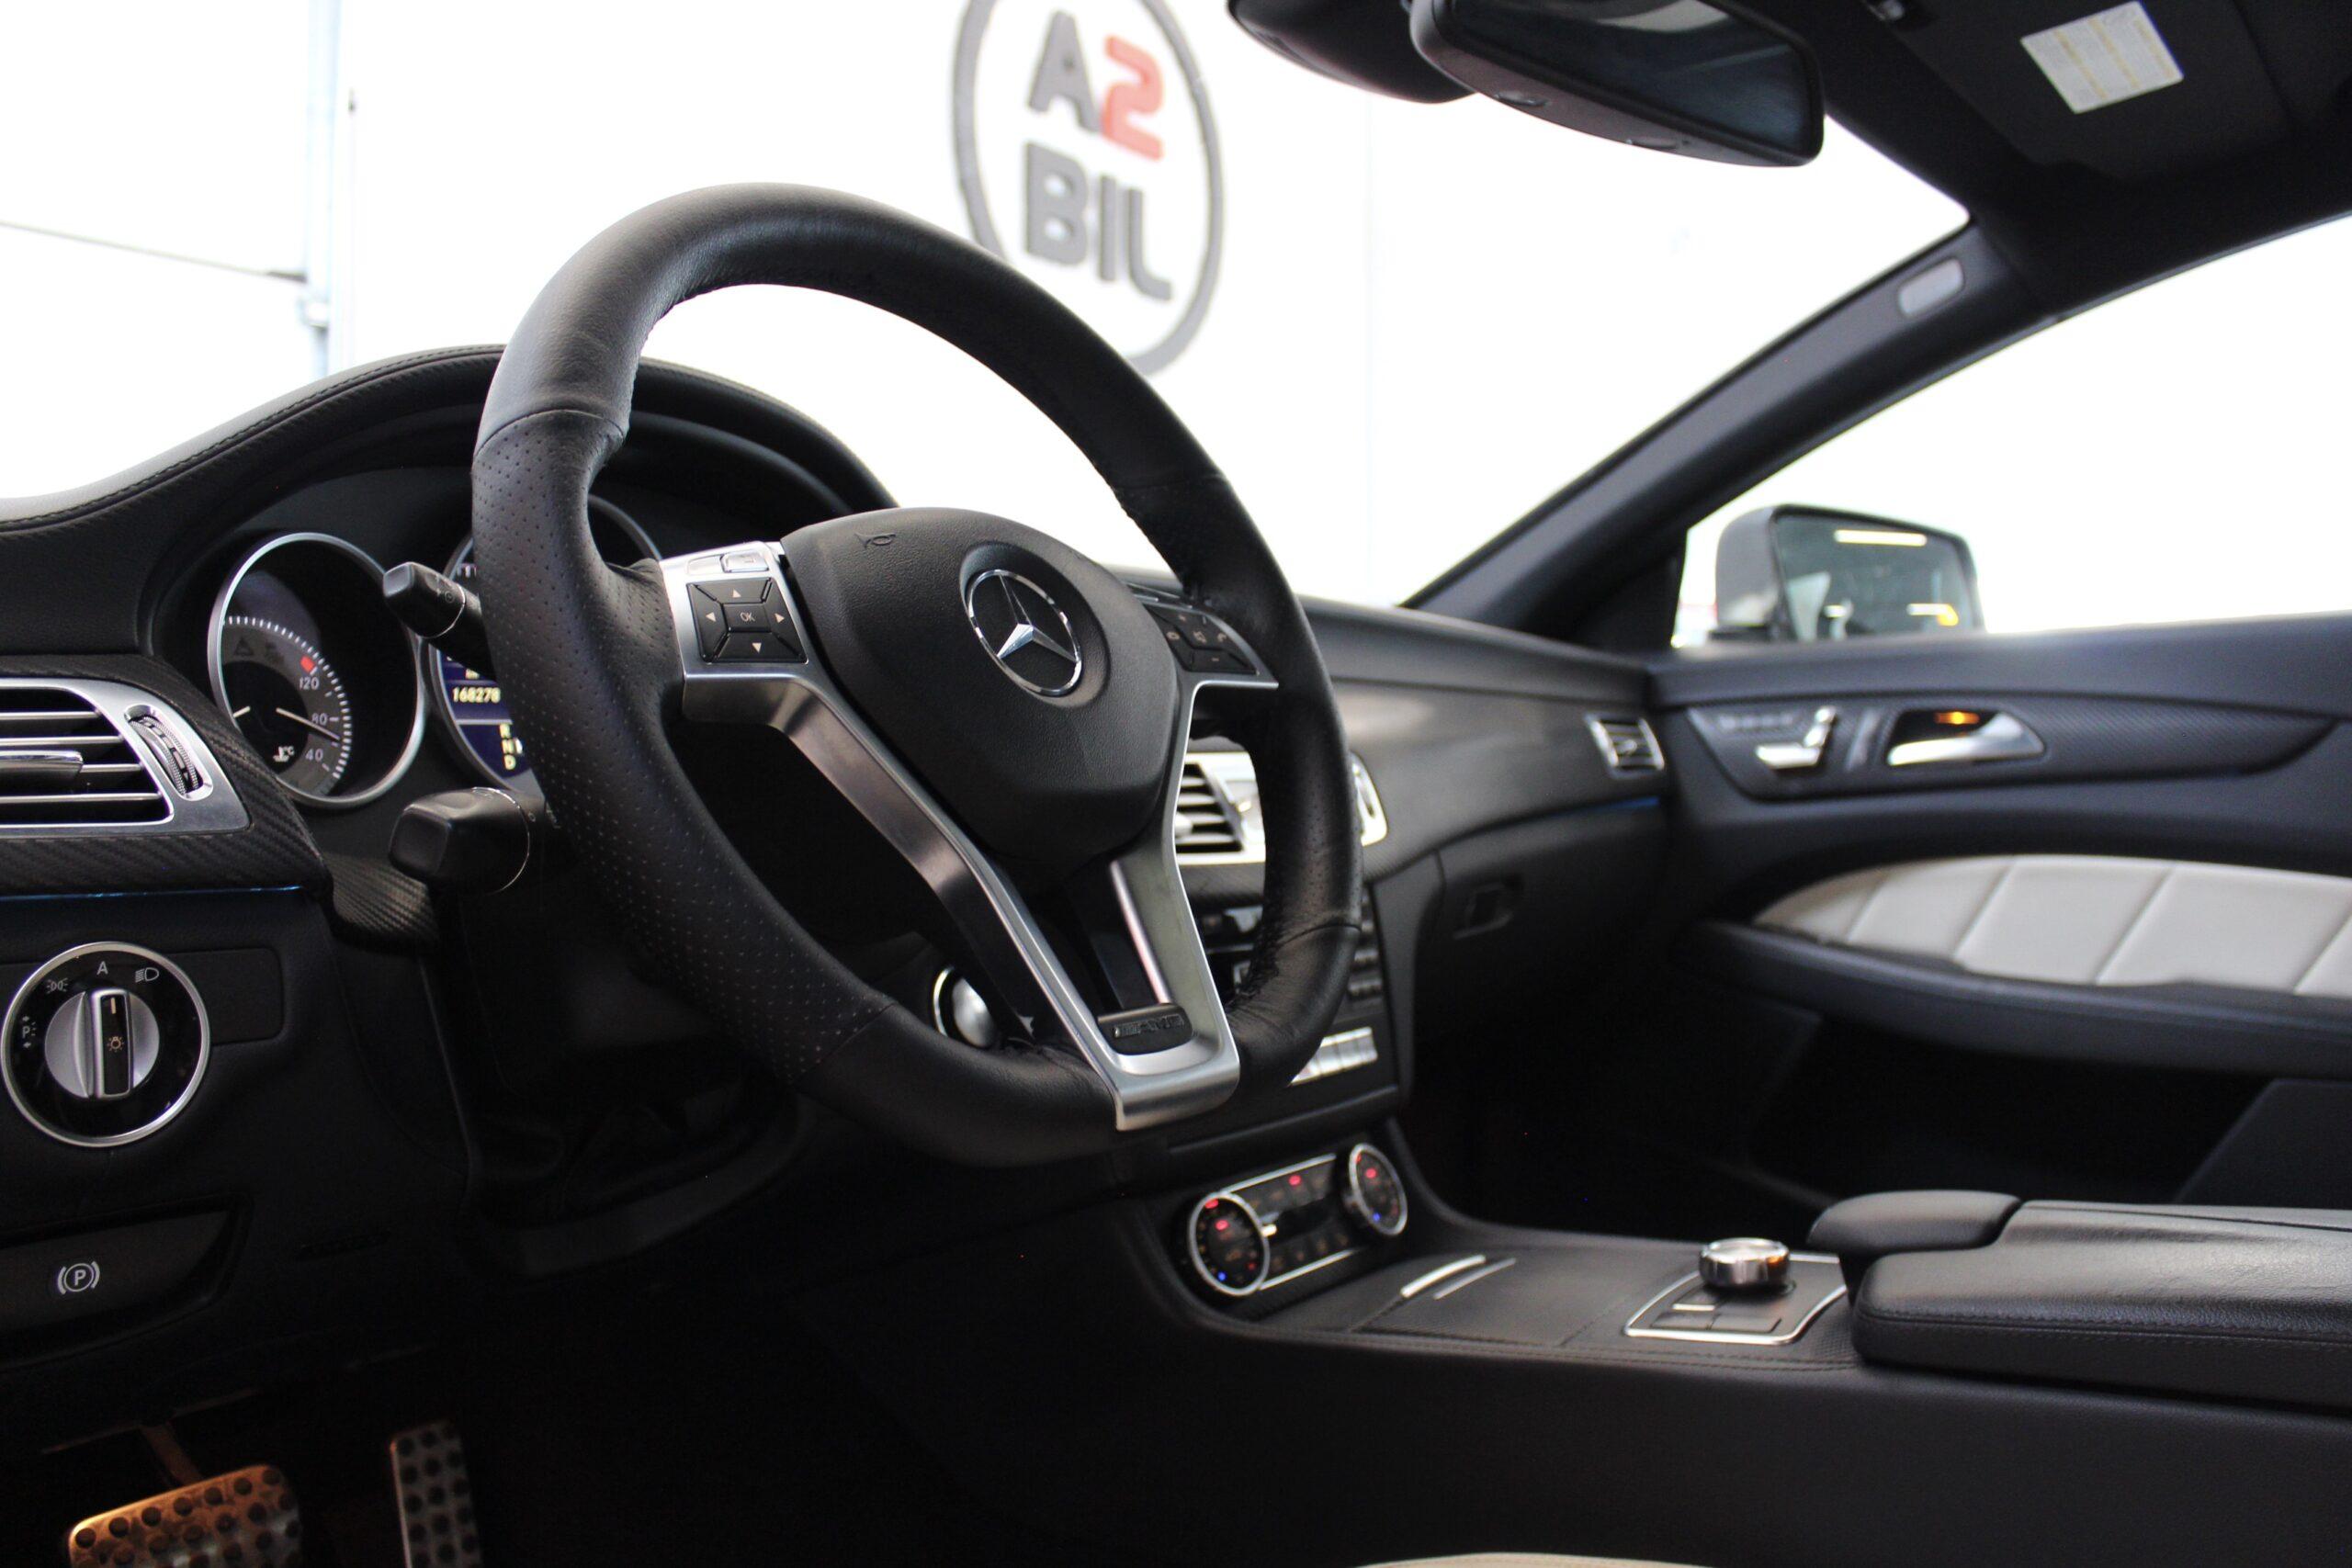 Mercedes-Benz CLS 350 CDI 7G-Tronic Plus AMG Sport 265hk